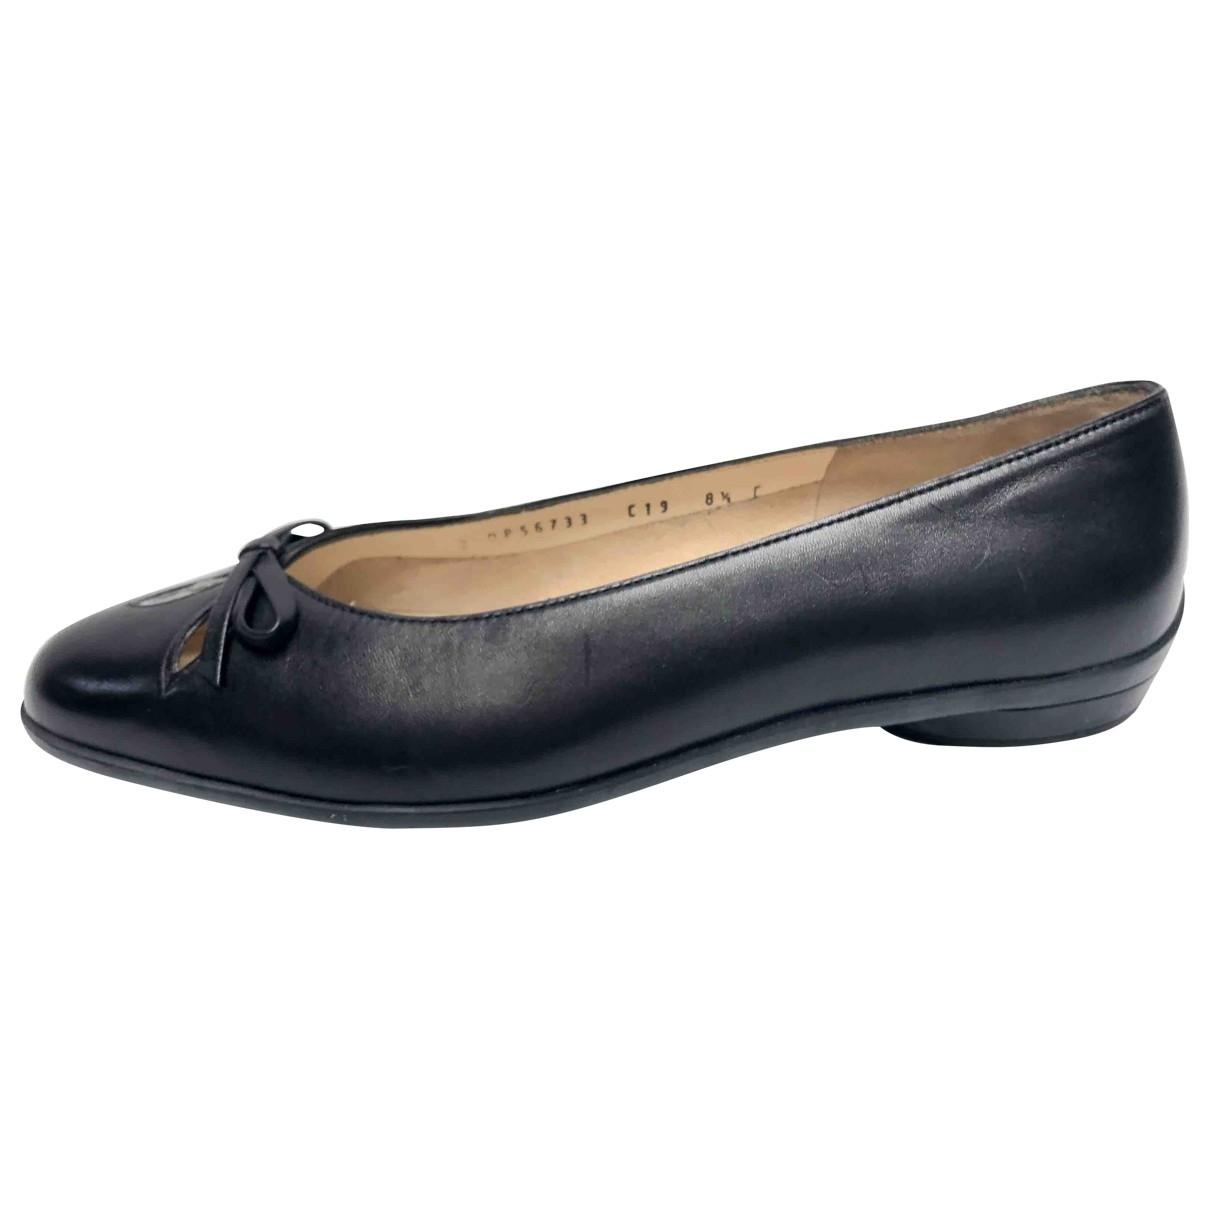 Salvatore Ferragamo \N Black Leather Ballet flats for Women 8.5 US